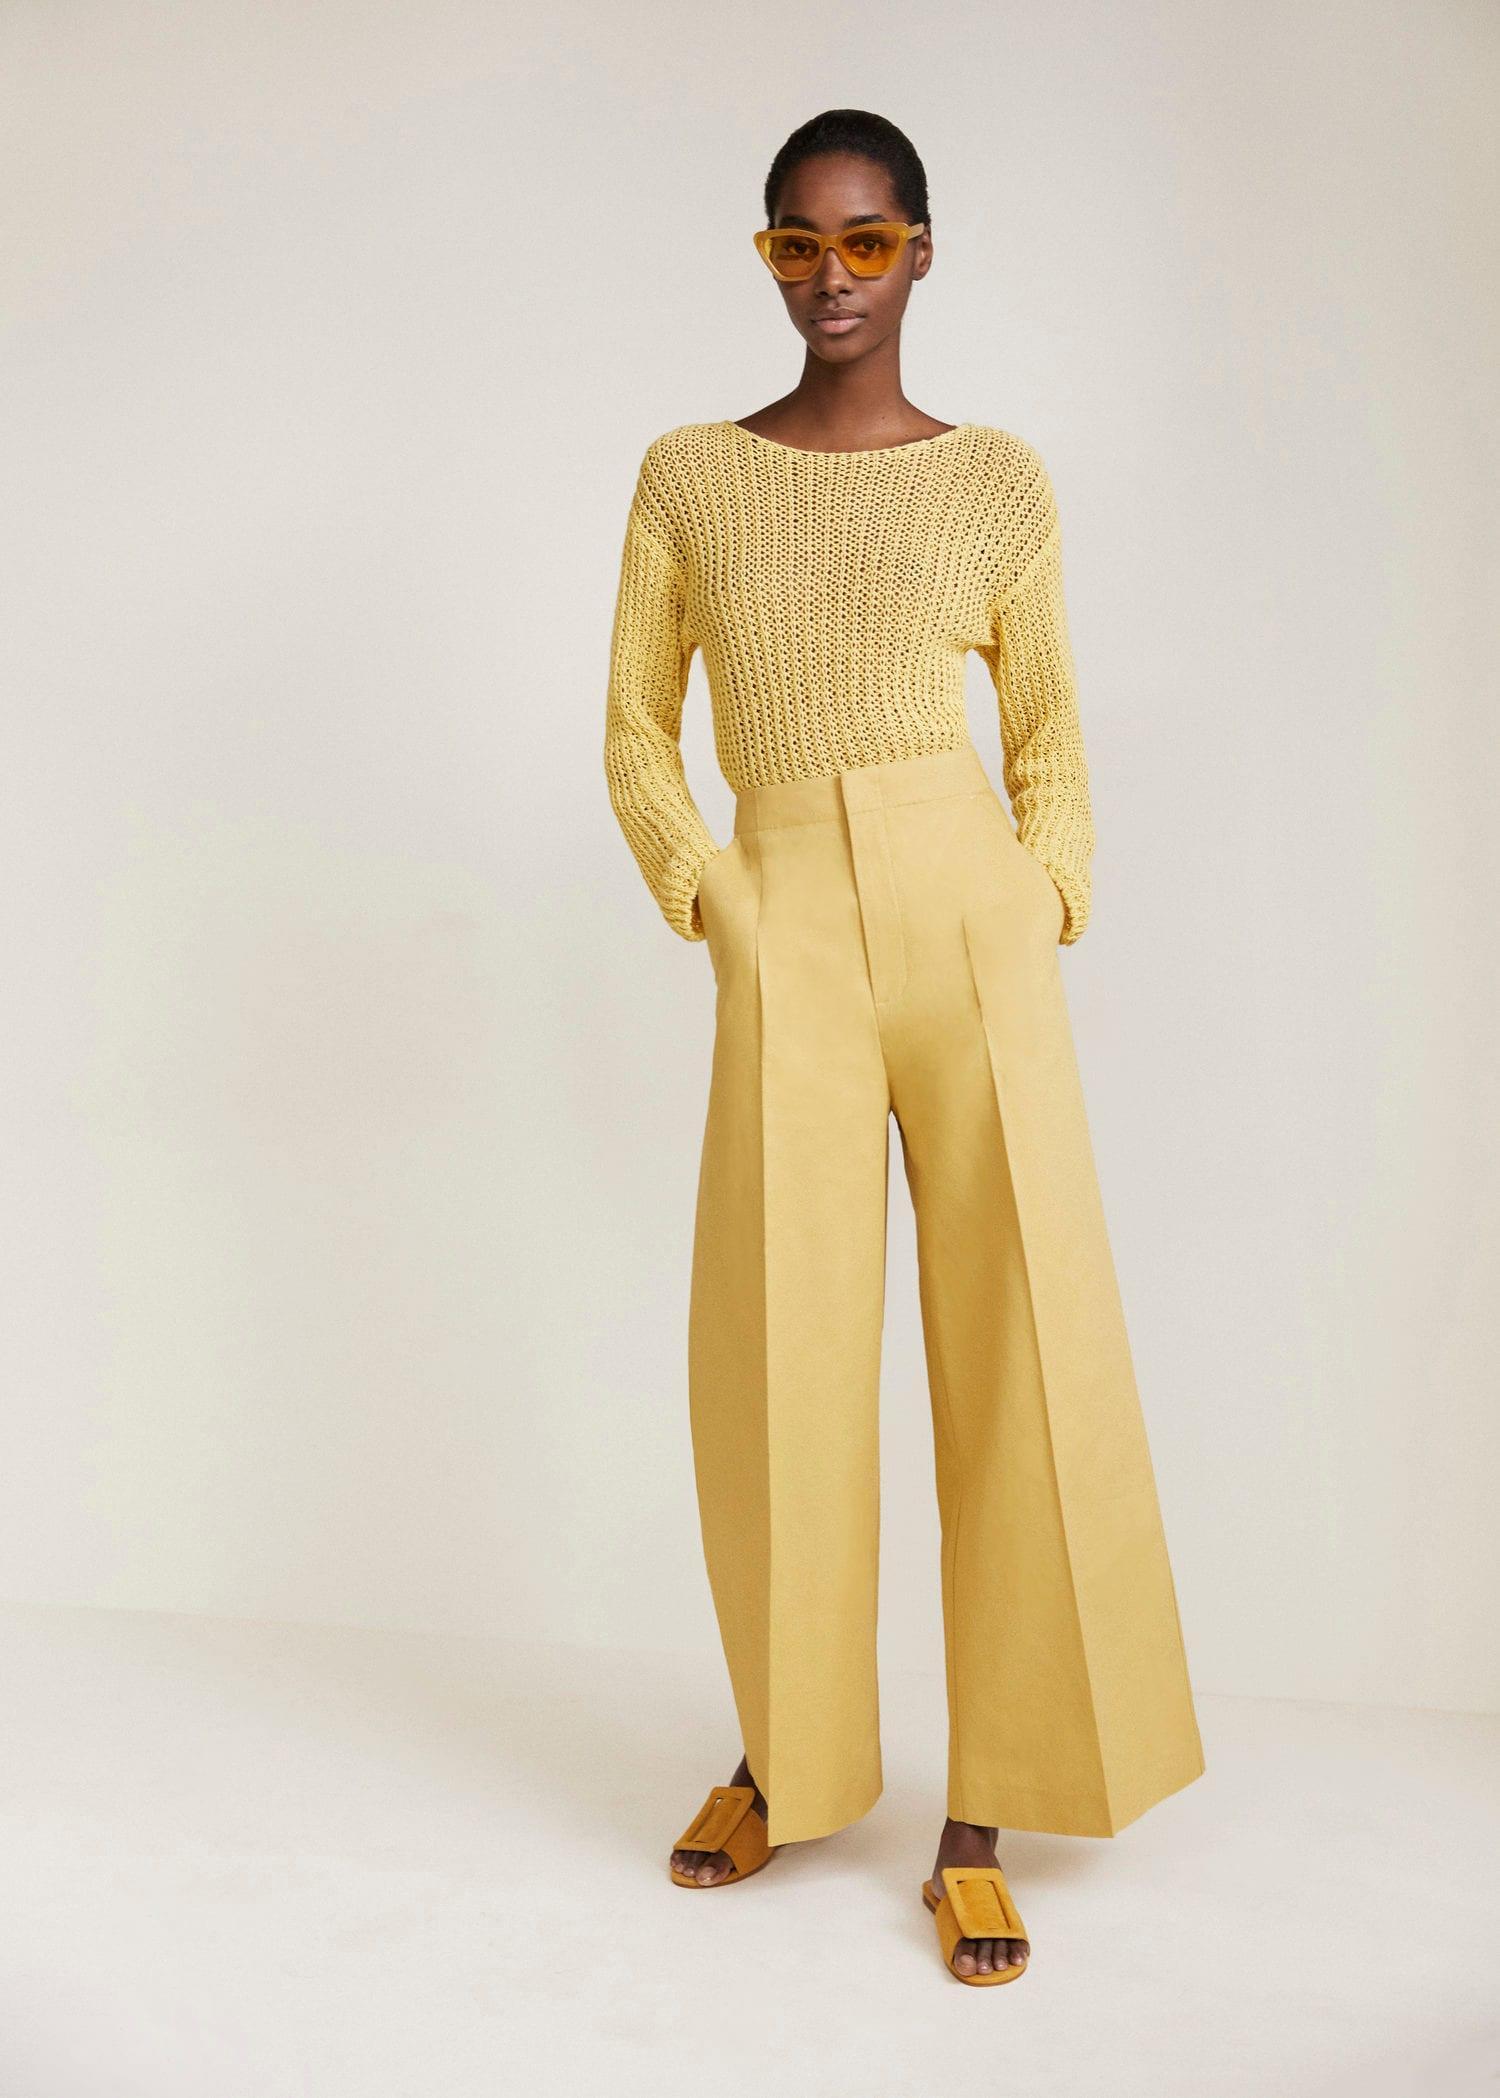 How to Wear Pastels 2019 Updated |Yellow on Yellow Tonal Monochrome| www.kittyandb.com #Yellow #Pastel #Chic #colourInspiration #OutfitInspiration #ColourPairing #monochrome #YellowAesthetic